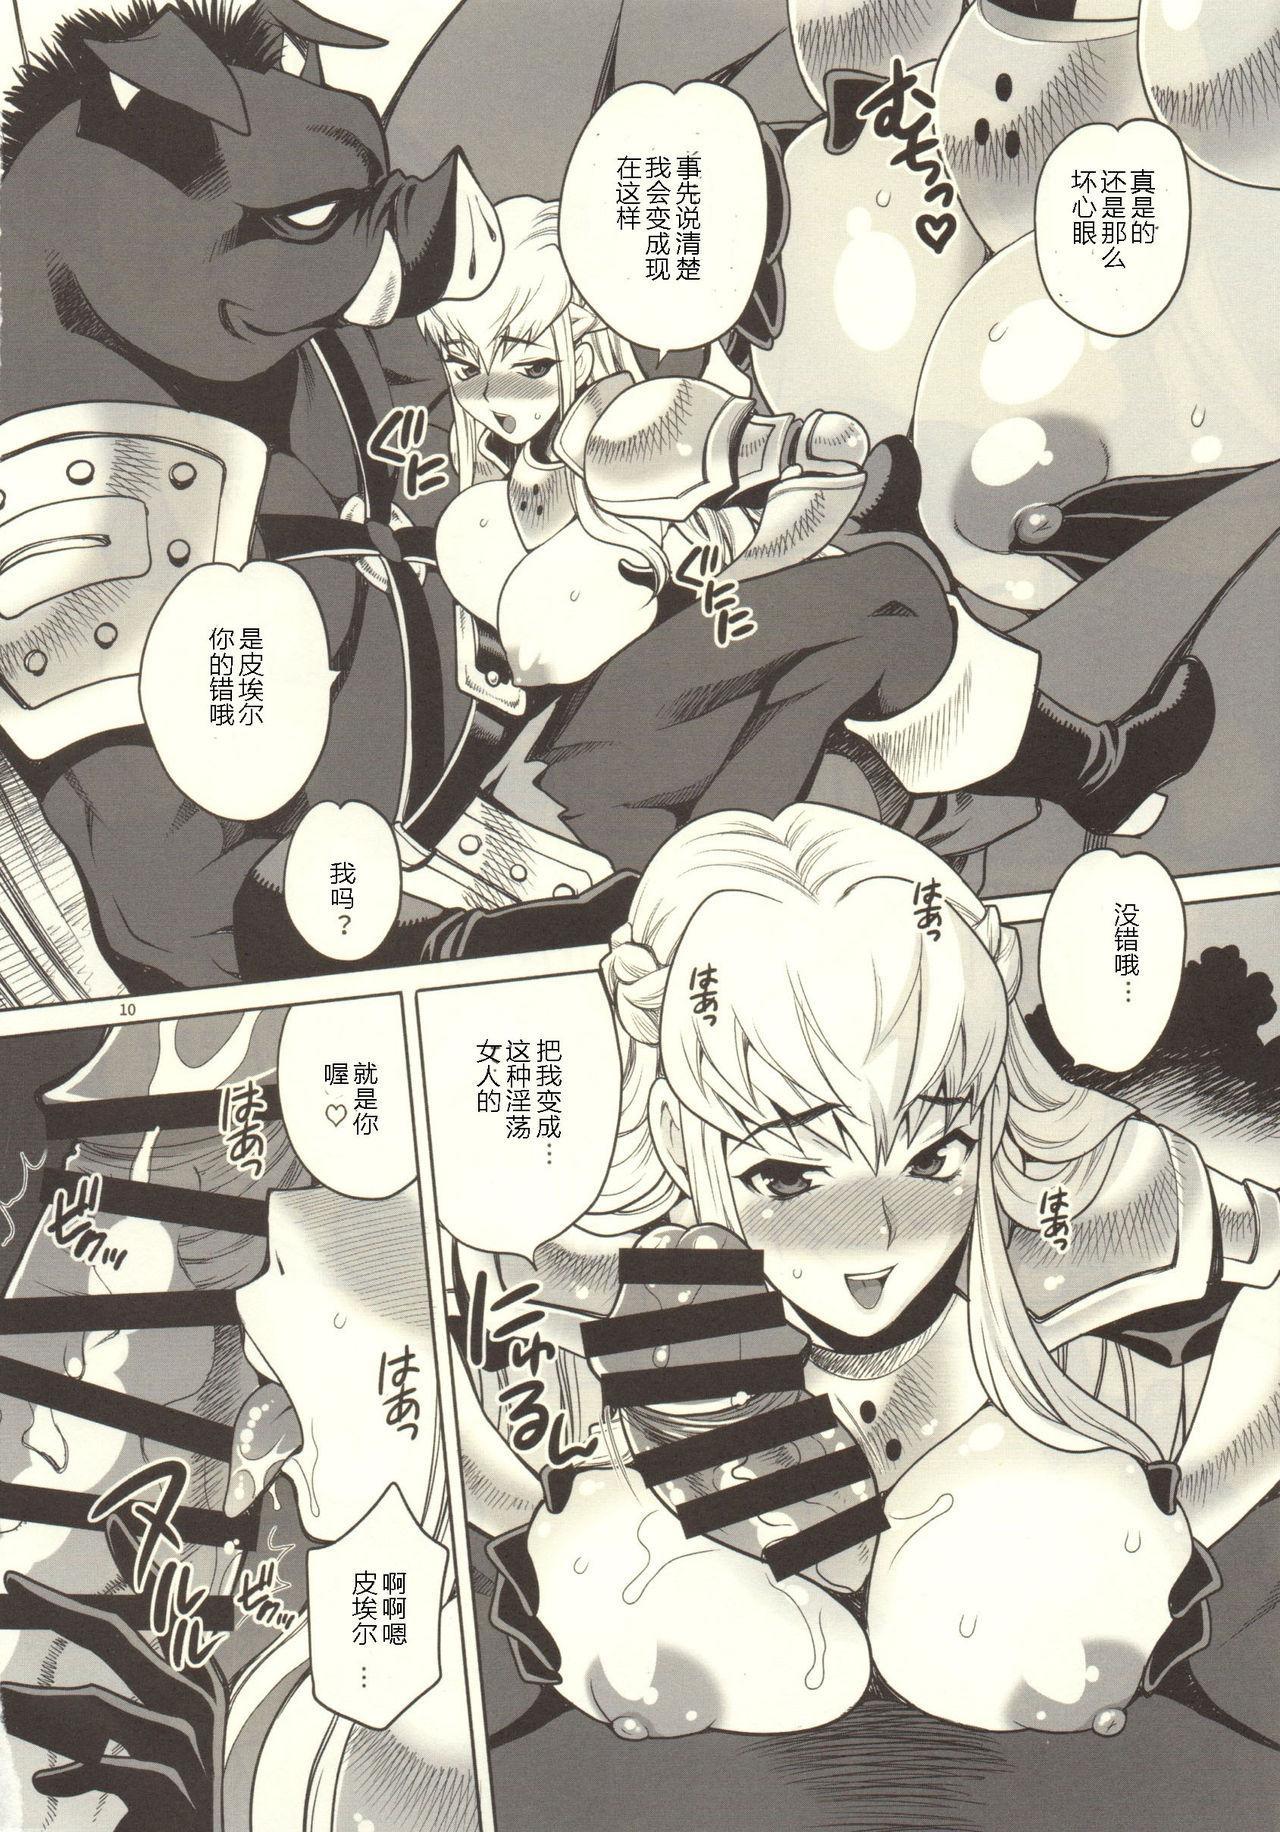 Yukiyanagi no Hon 37 Buta to Onnakishi - Lady knight in love with Orc 8